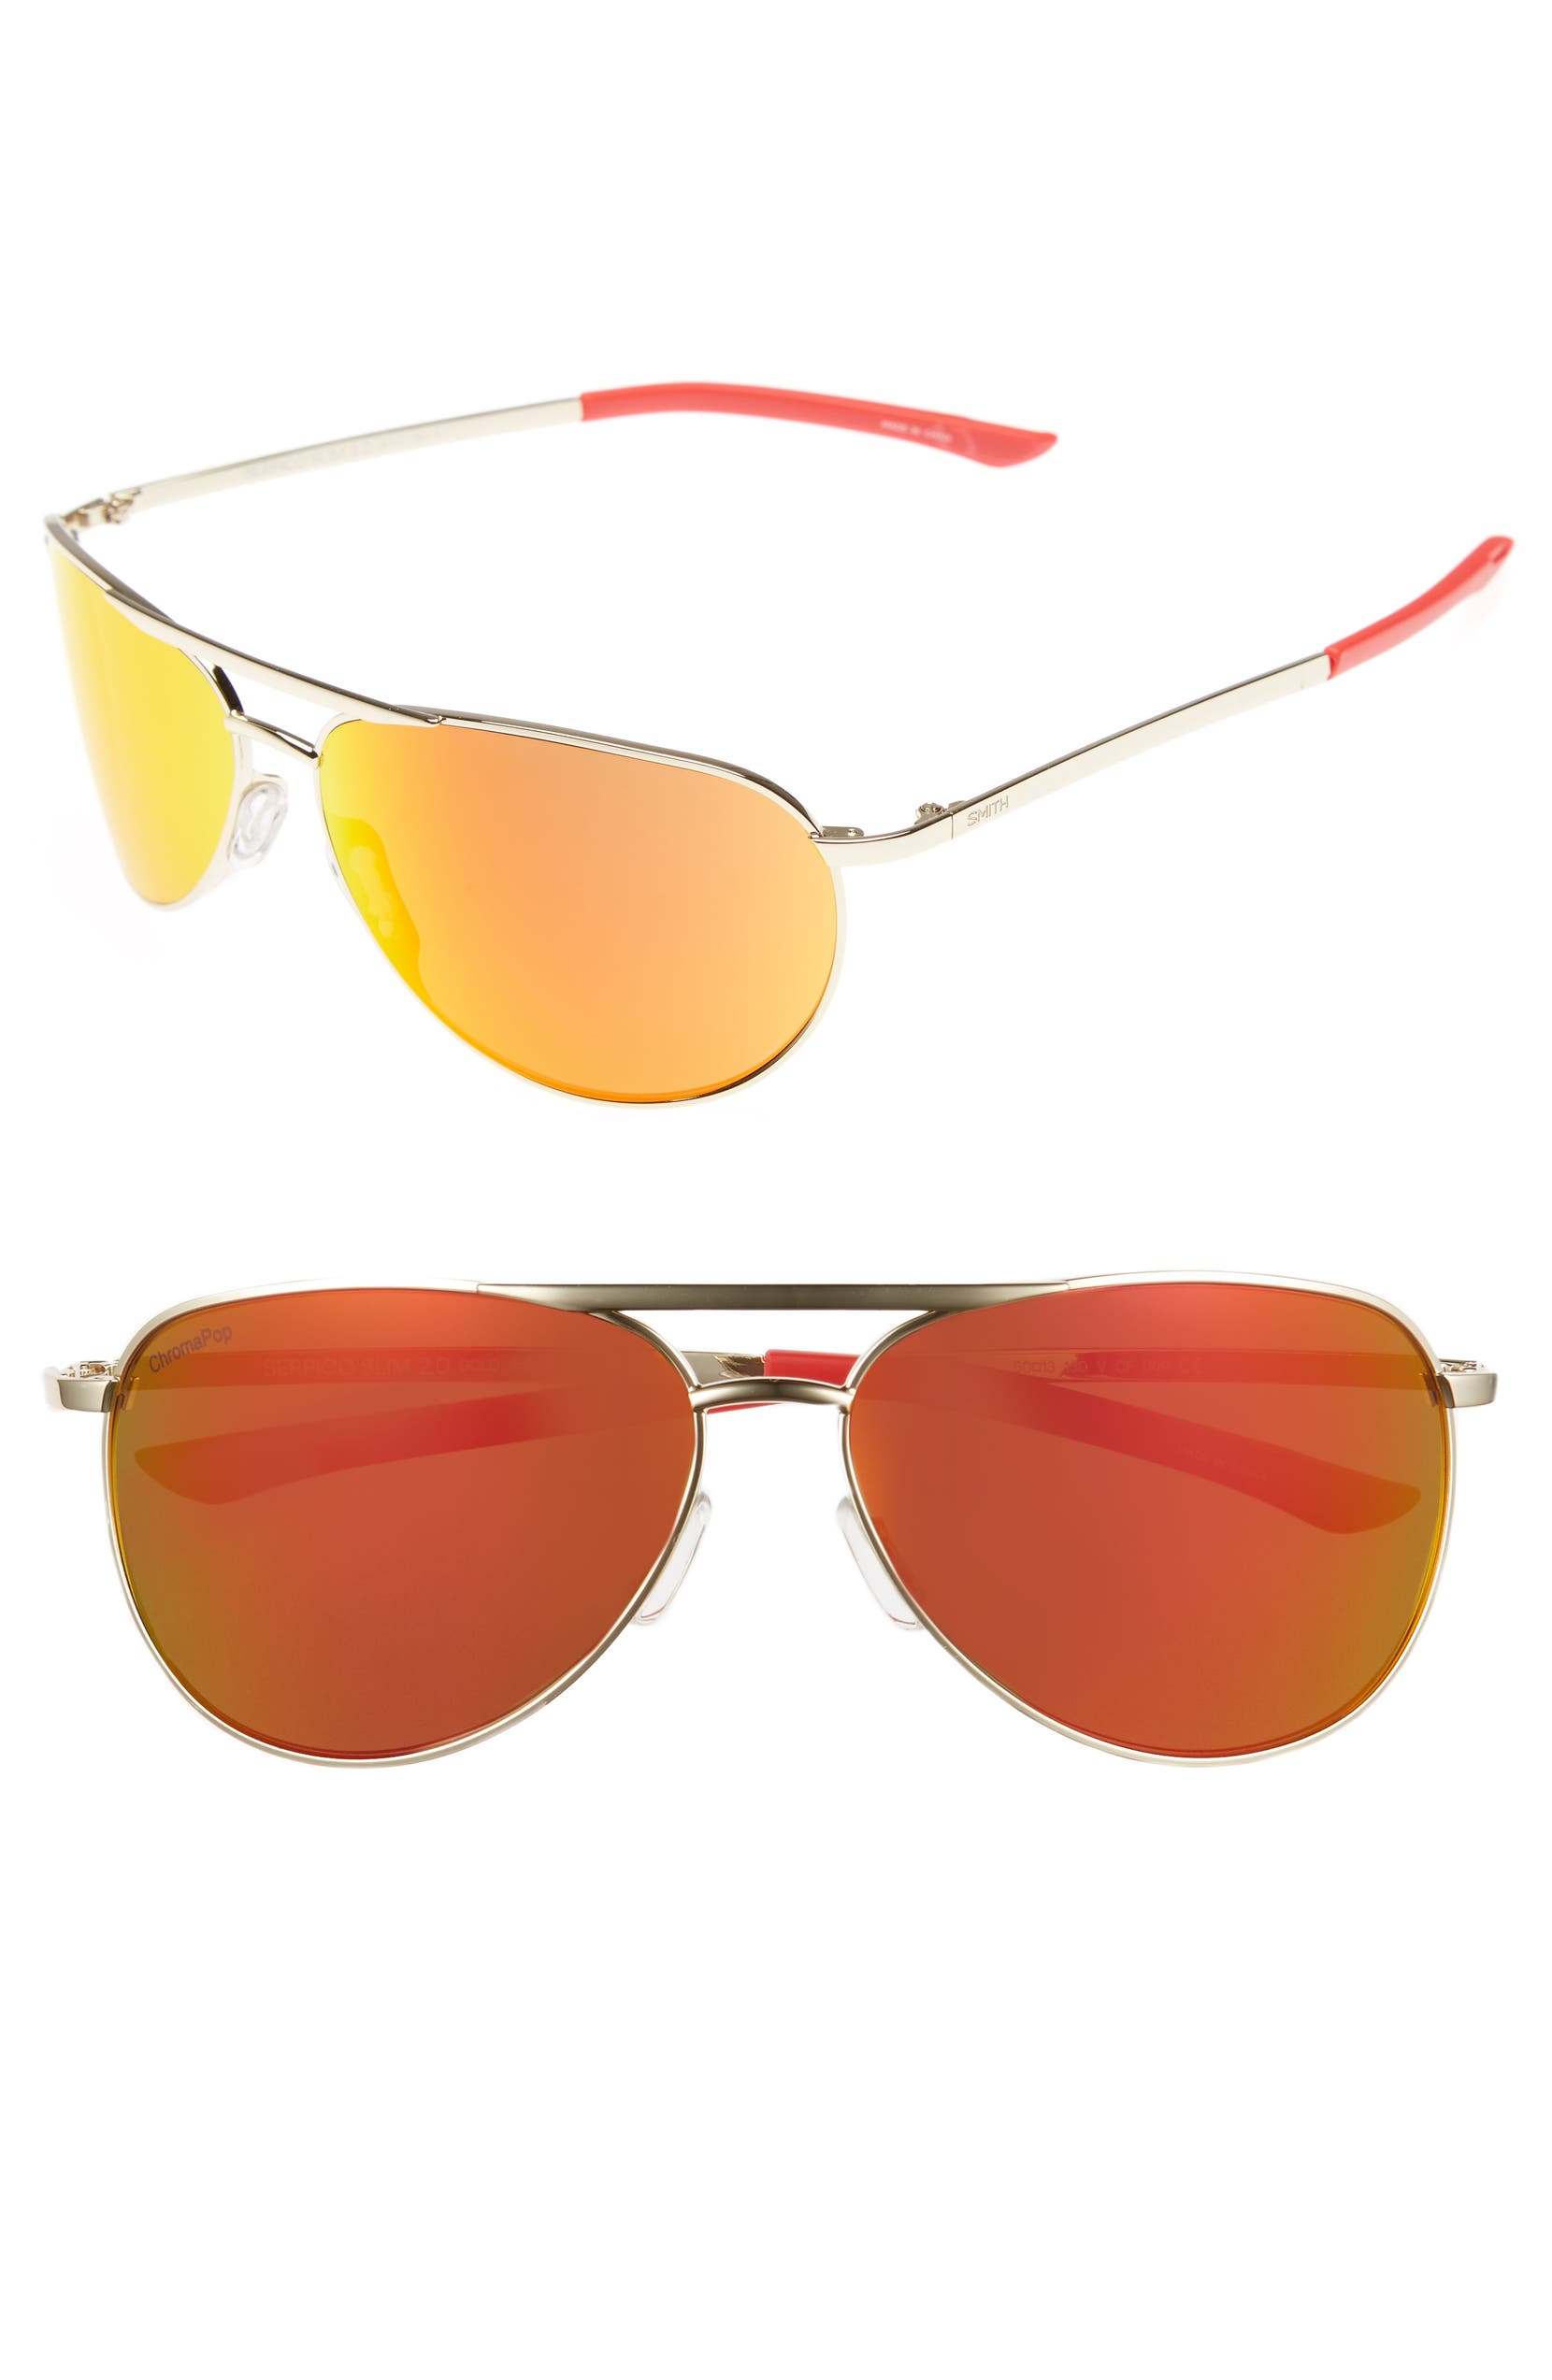 9a32f83f390 Smith Serpico Slim 2.0 60mm ChromaPop Polarized Aviator Sunglasses ...